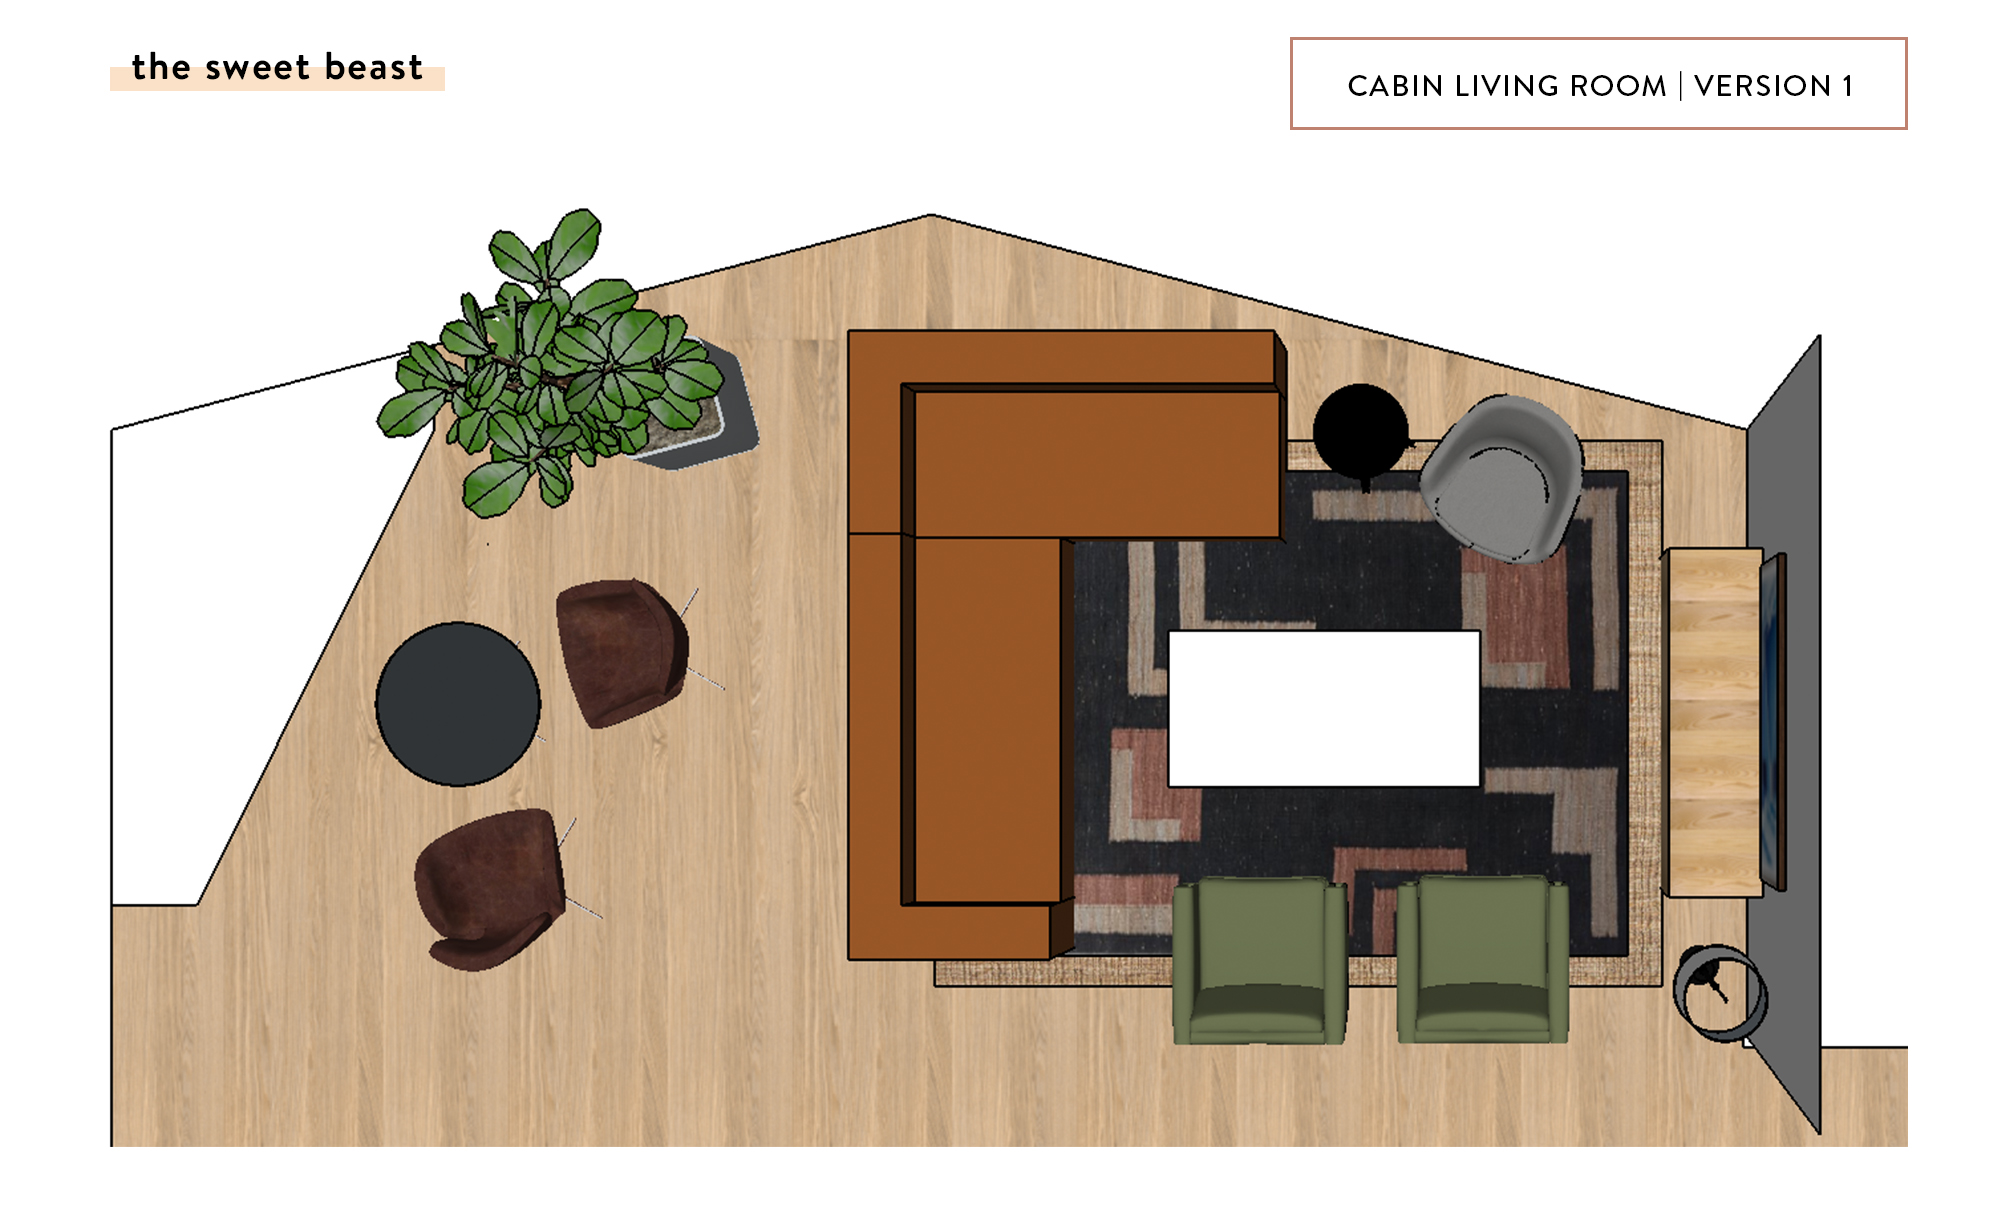 Cabin Living Room SketchUp Layout